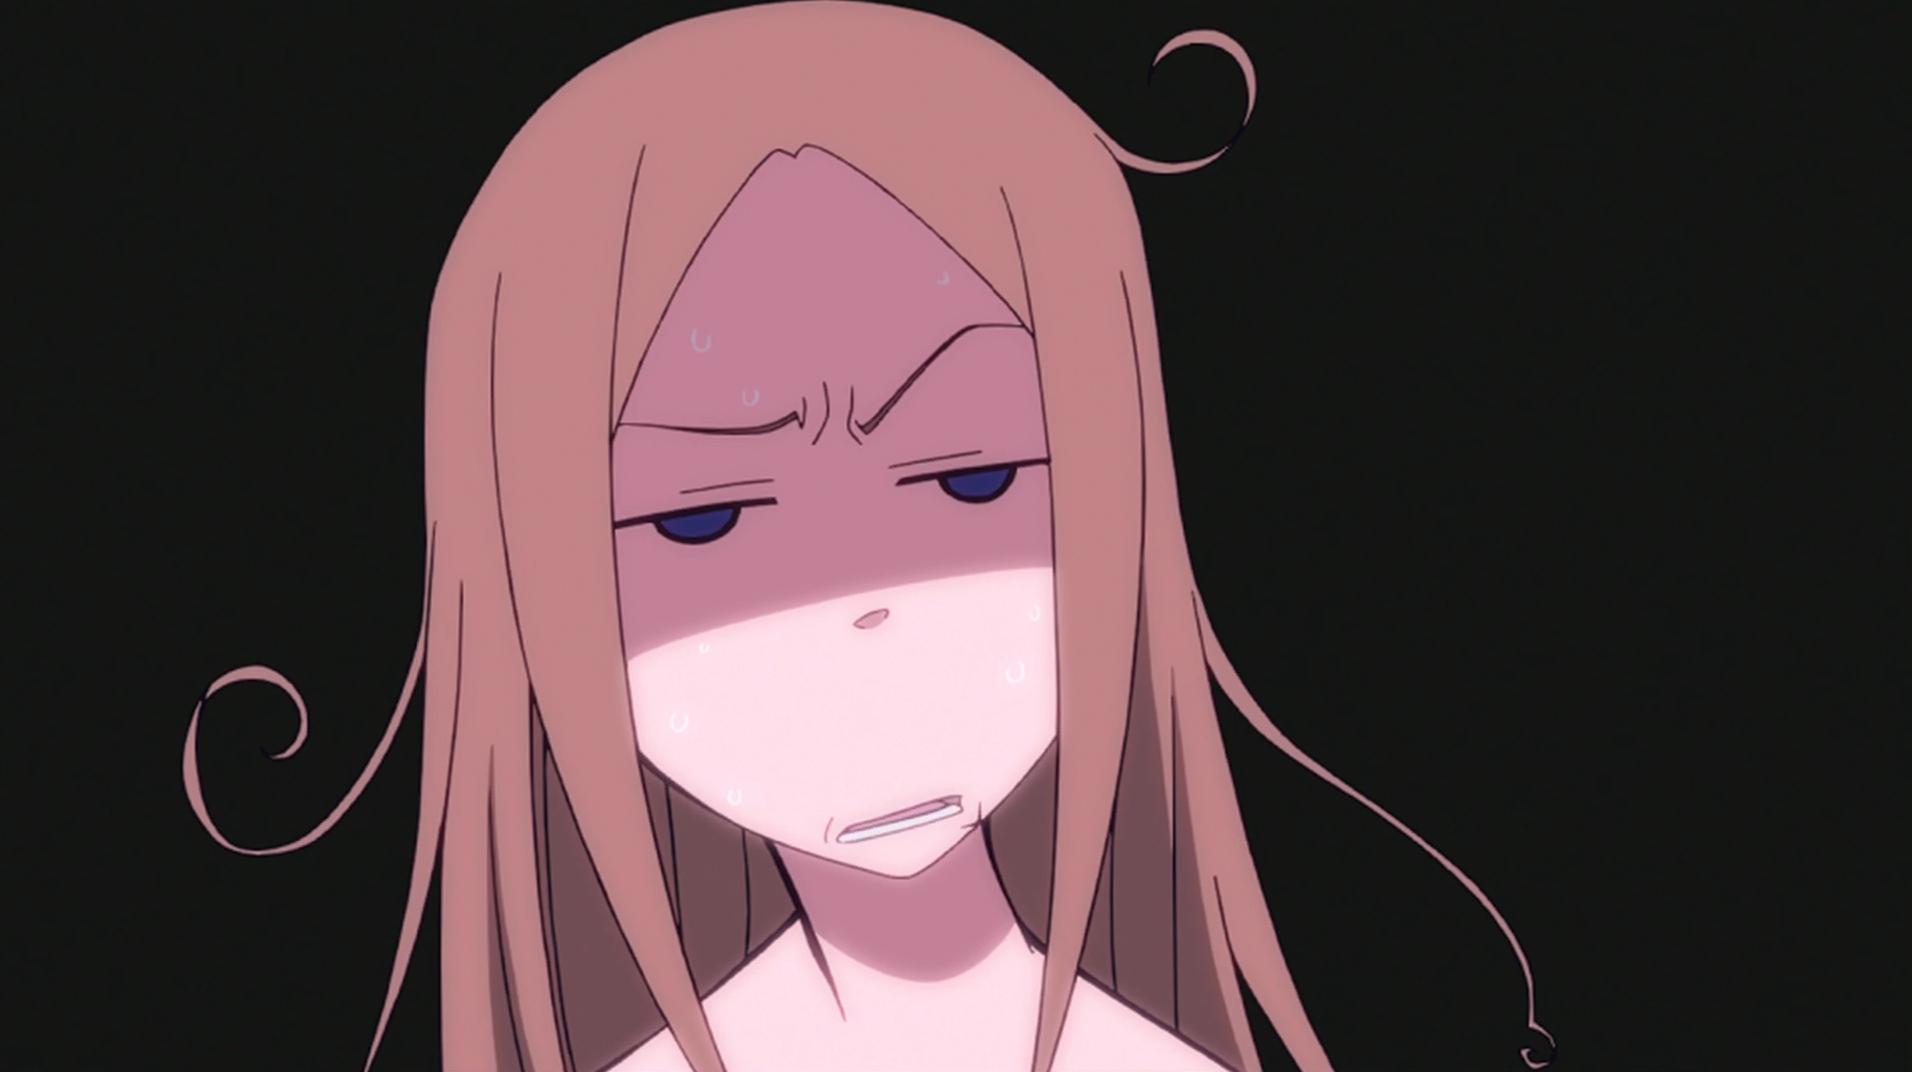 Image - Soul Eater Episode 16 - Liz is unamused by Kid.png ...  Image - Soul Ea...